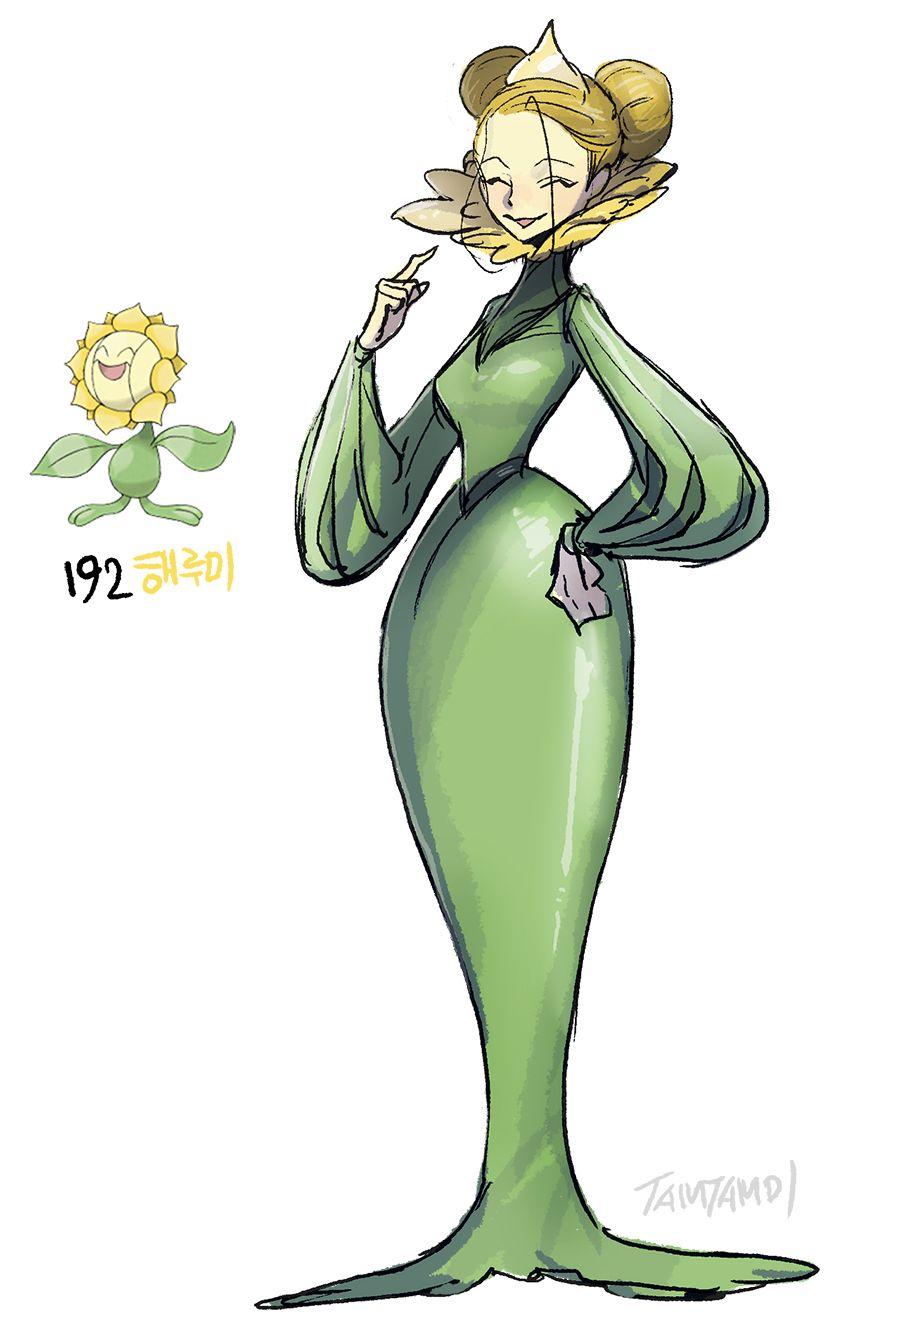 Pokemon Gijinka 191. Sunkern 192. Sunflora | pokémon gijinka …